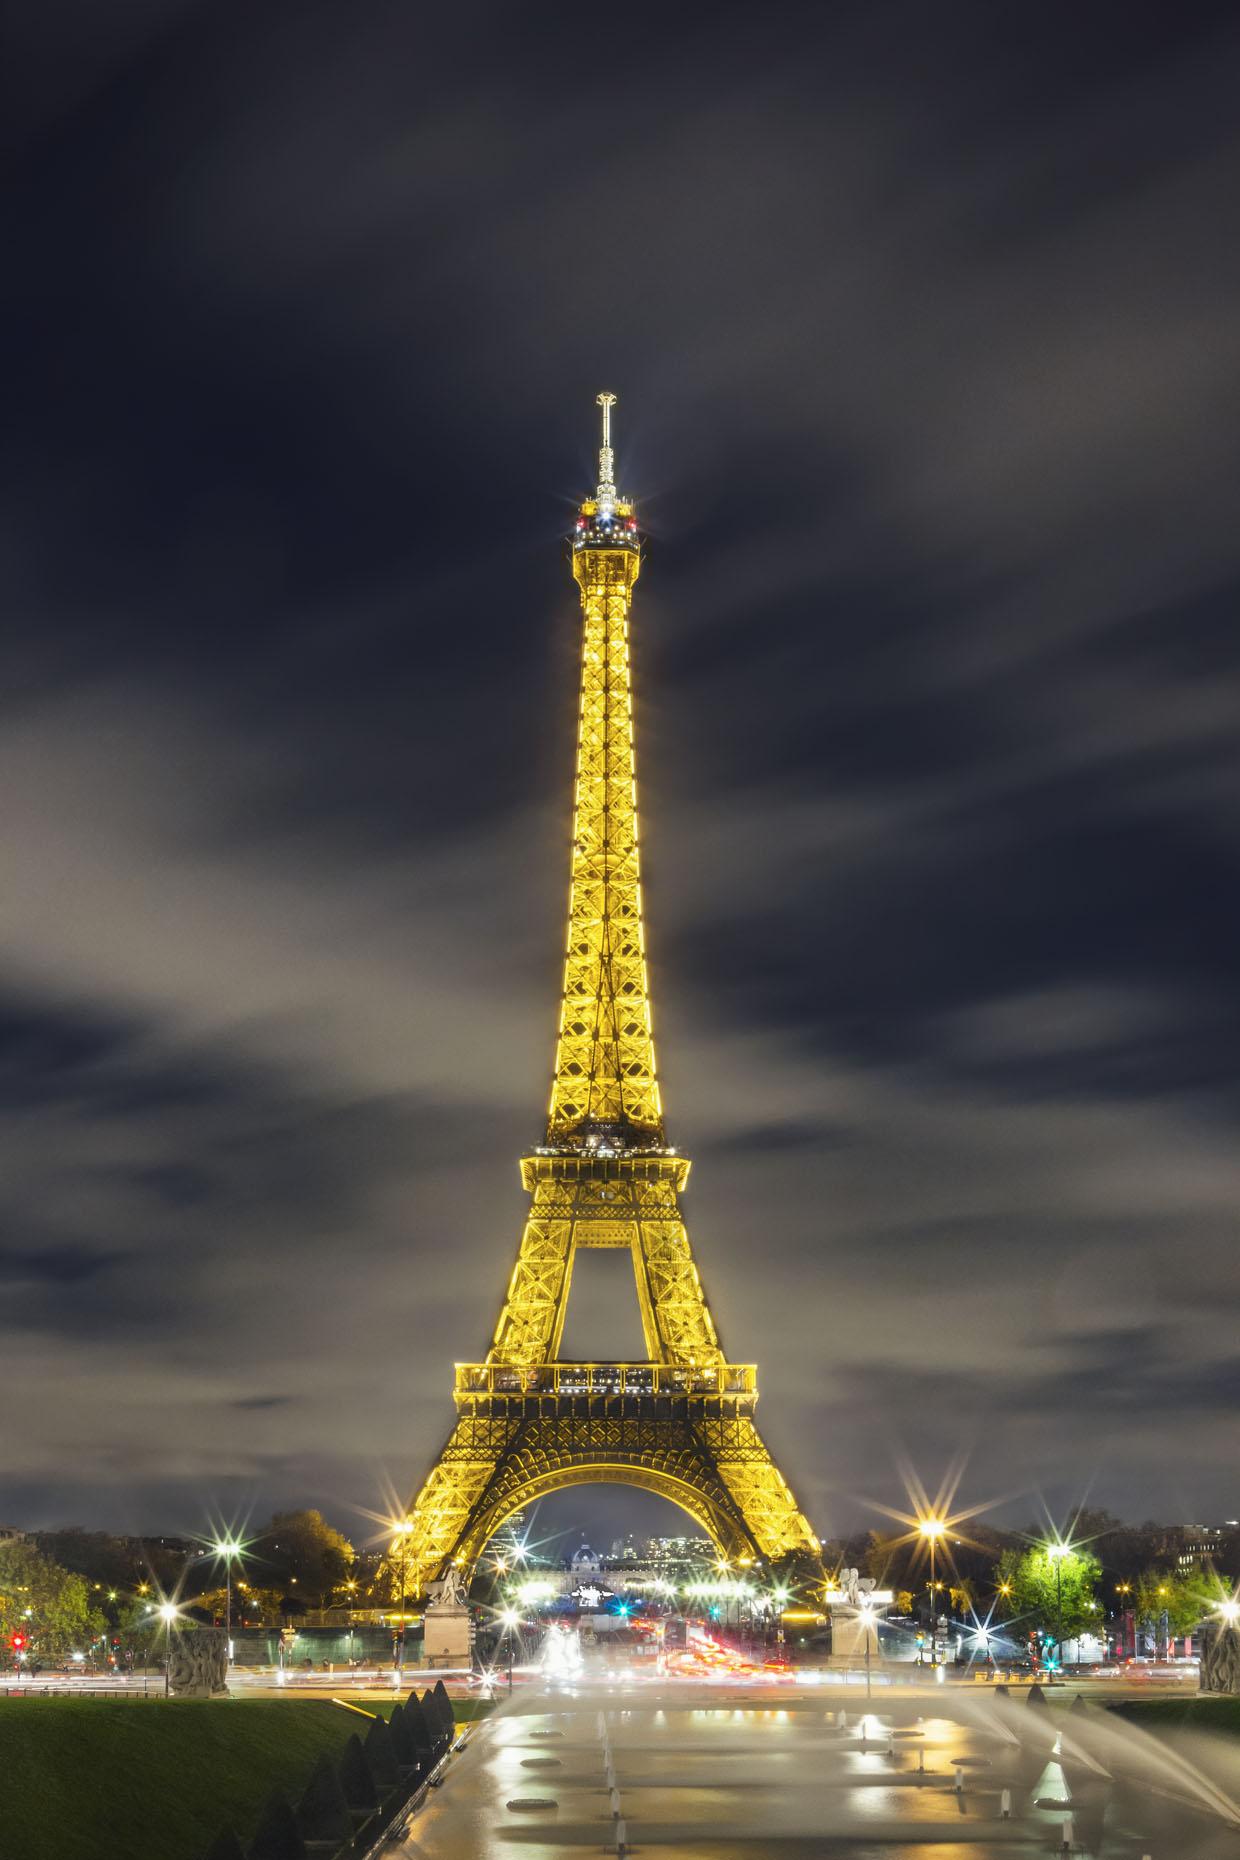 Paris_EiffelTowerTwilight_11.jpg